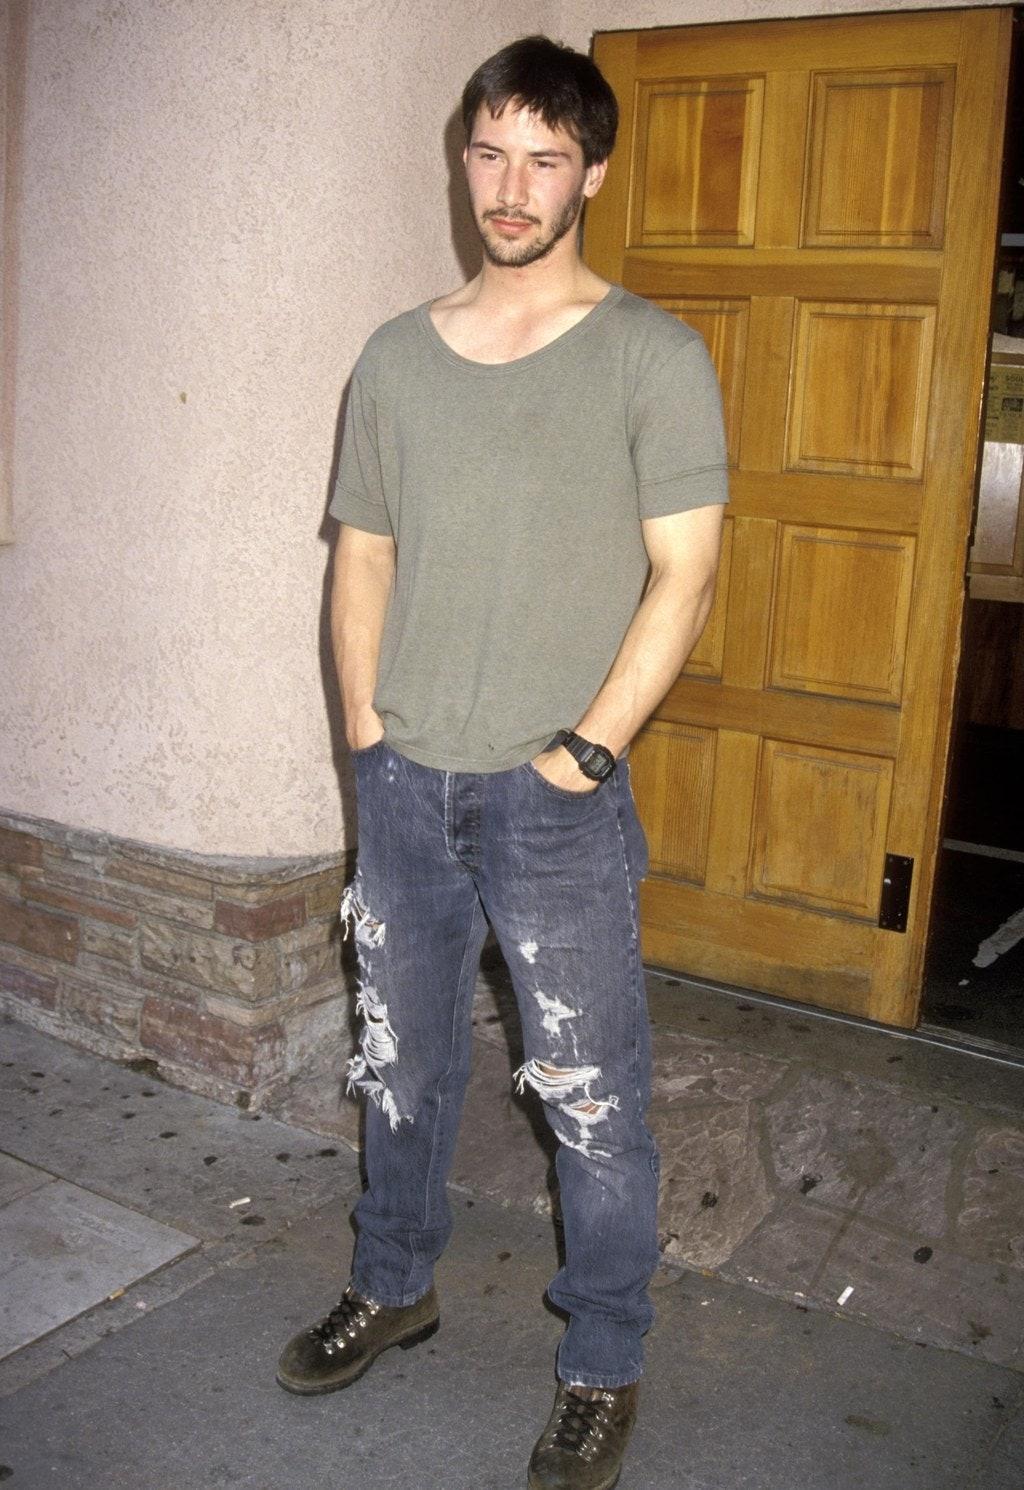 Hollywoodban, 1994-ben